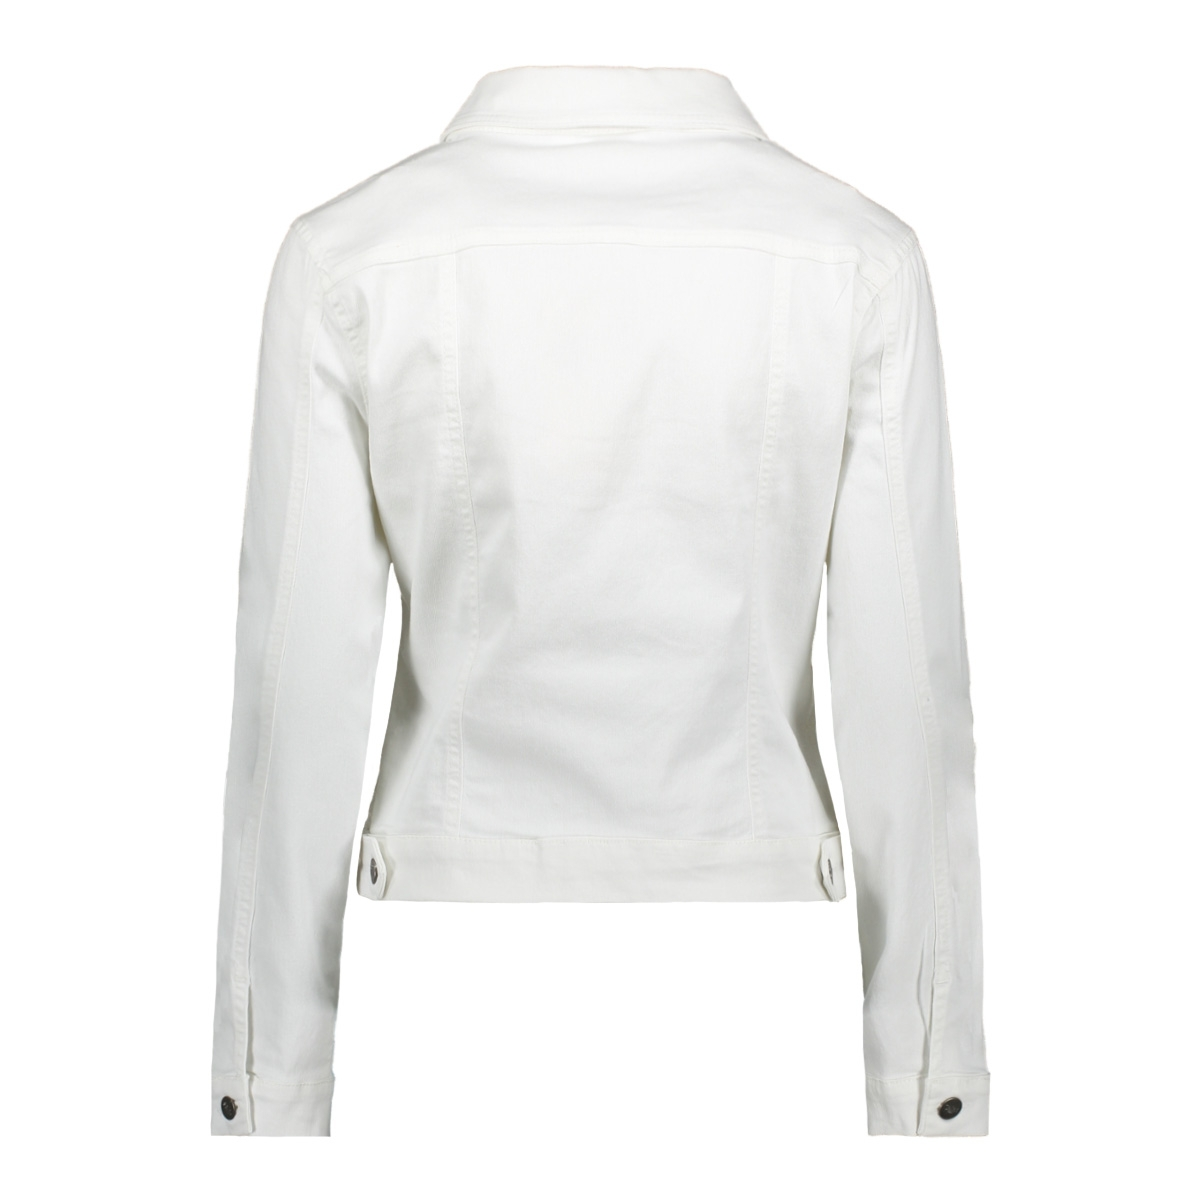 alisonsz denim jacket 30501568 saint tropez jas 11601